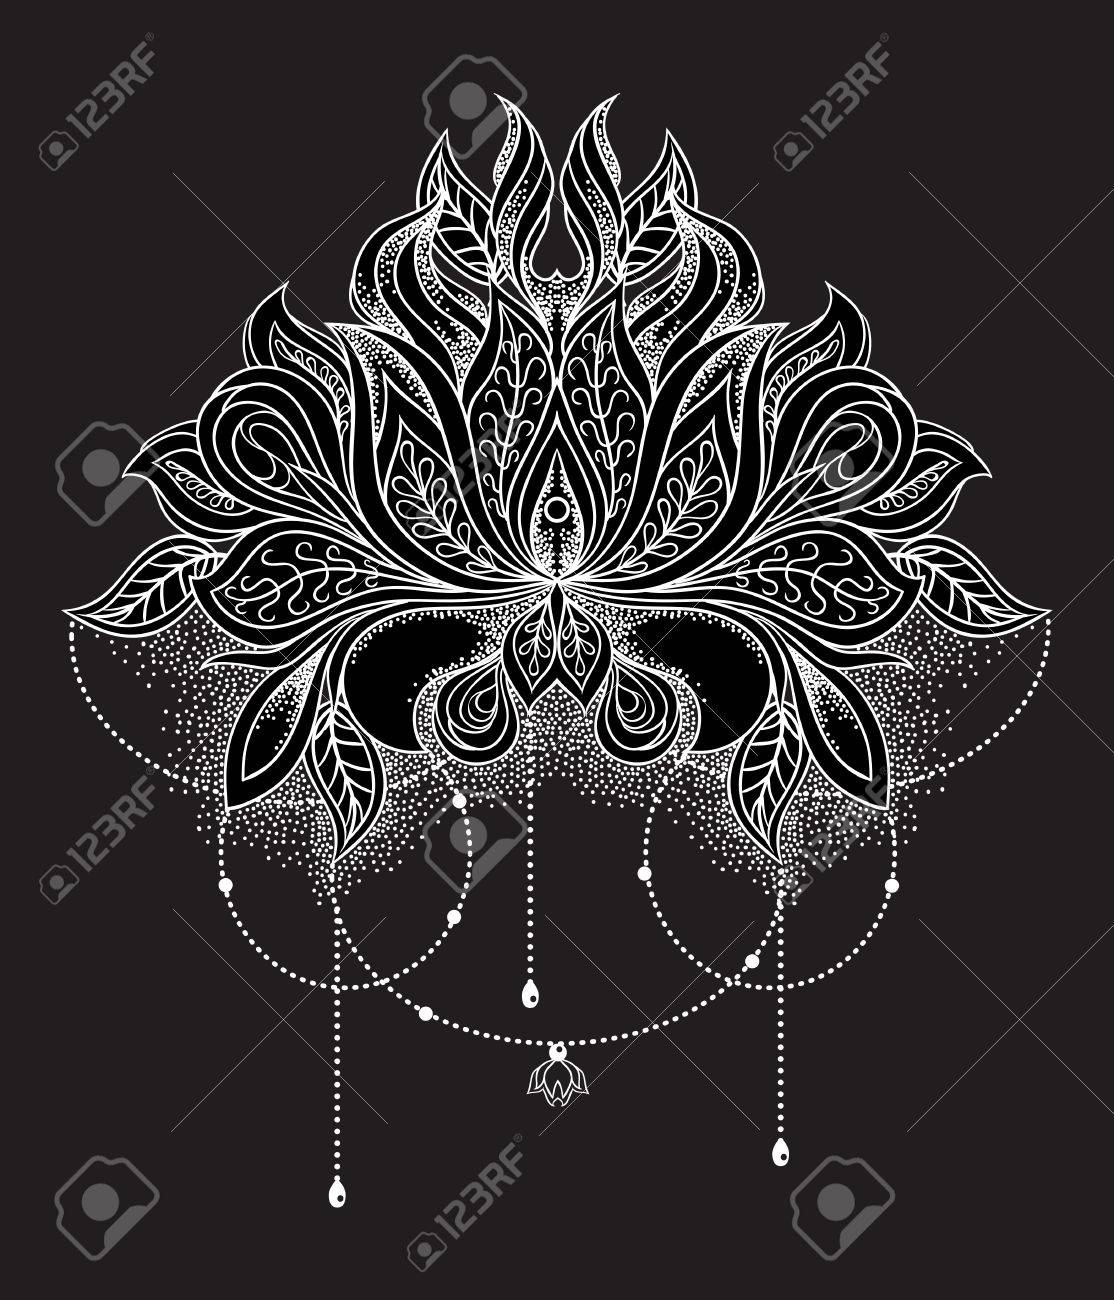 Beautiful Hand Drawn Ornamental Lotus Flower Ethnic Patterned